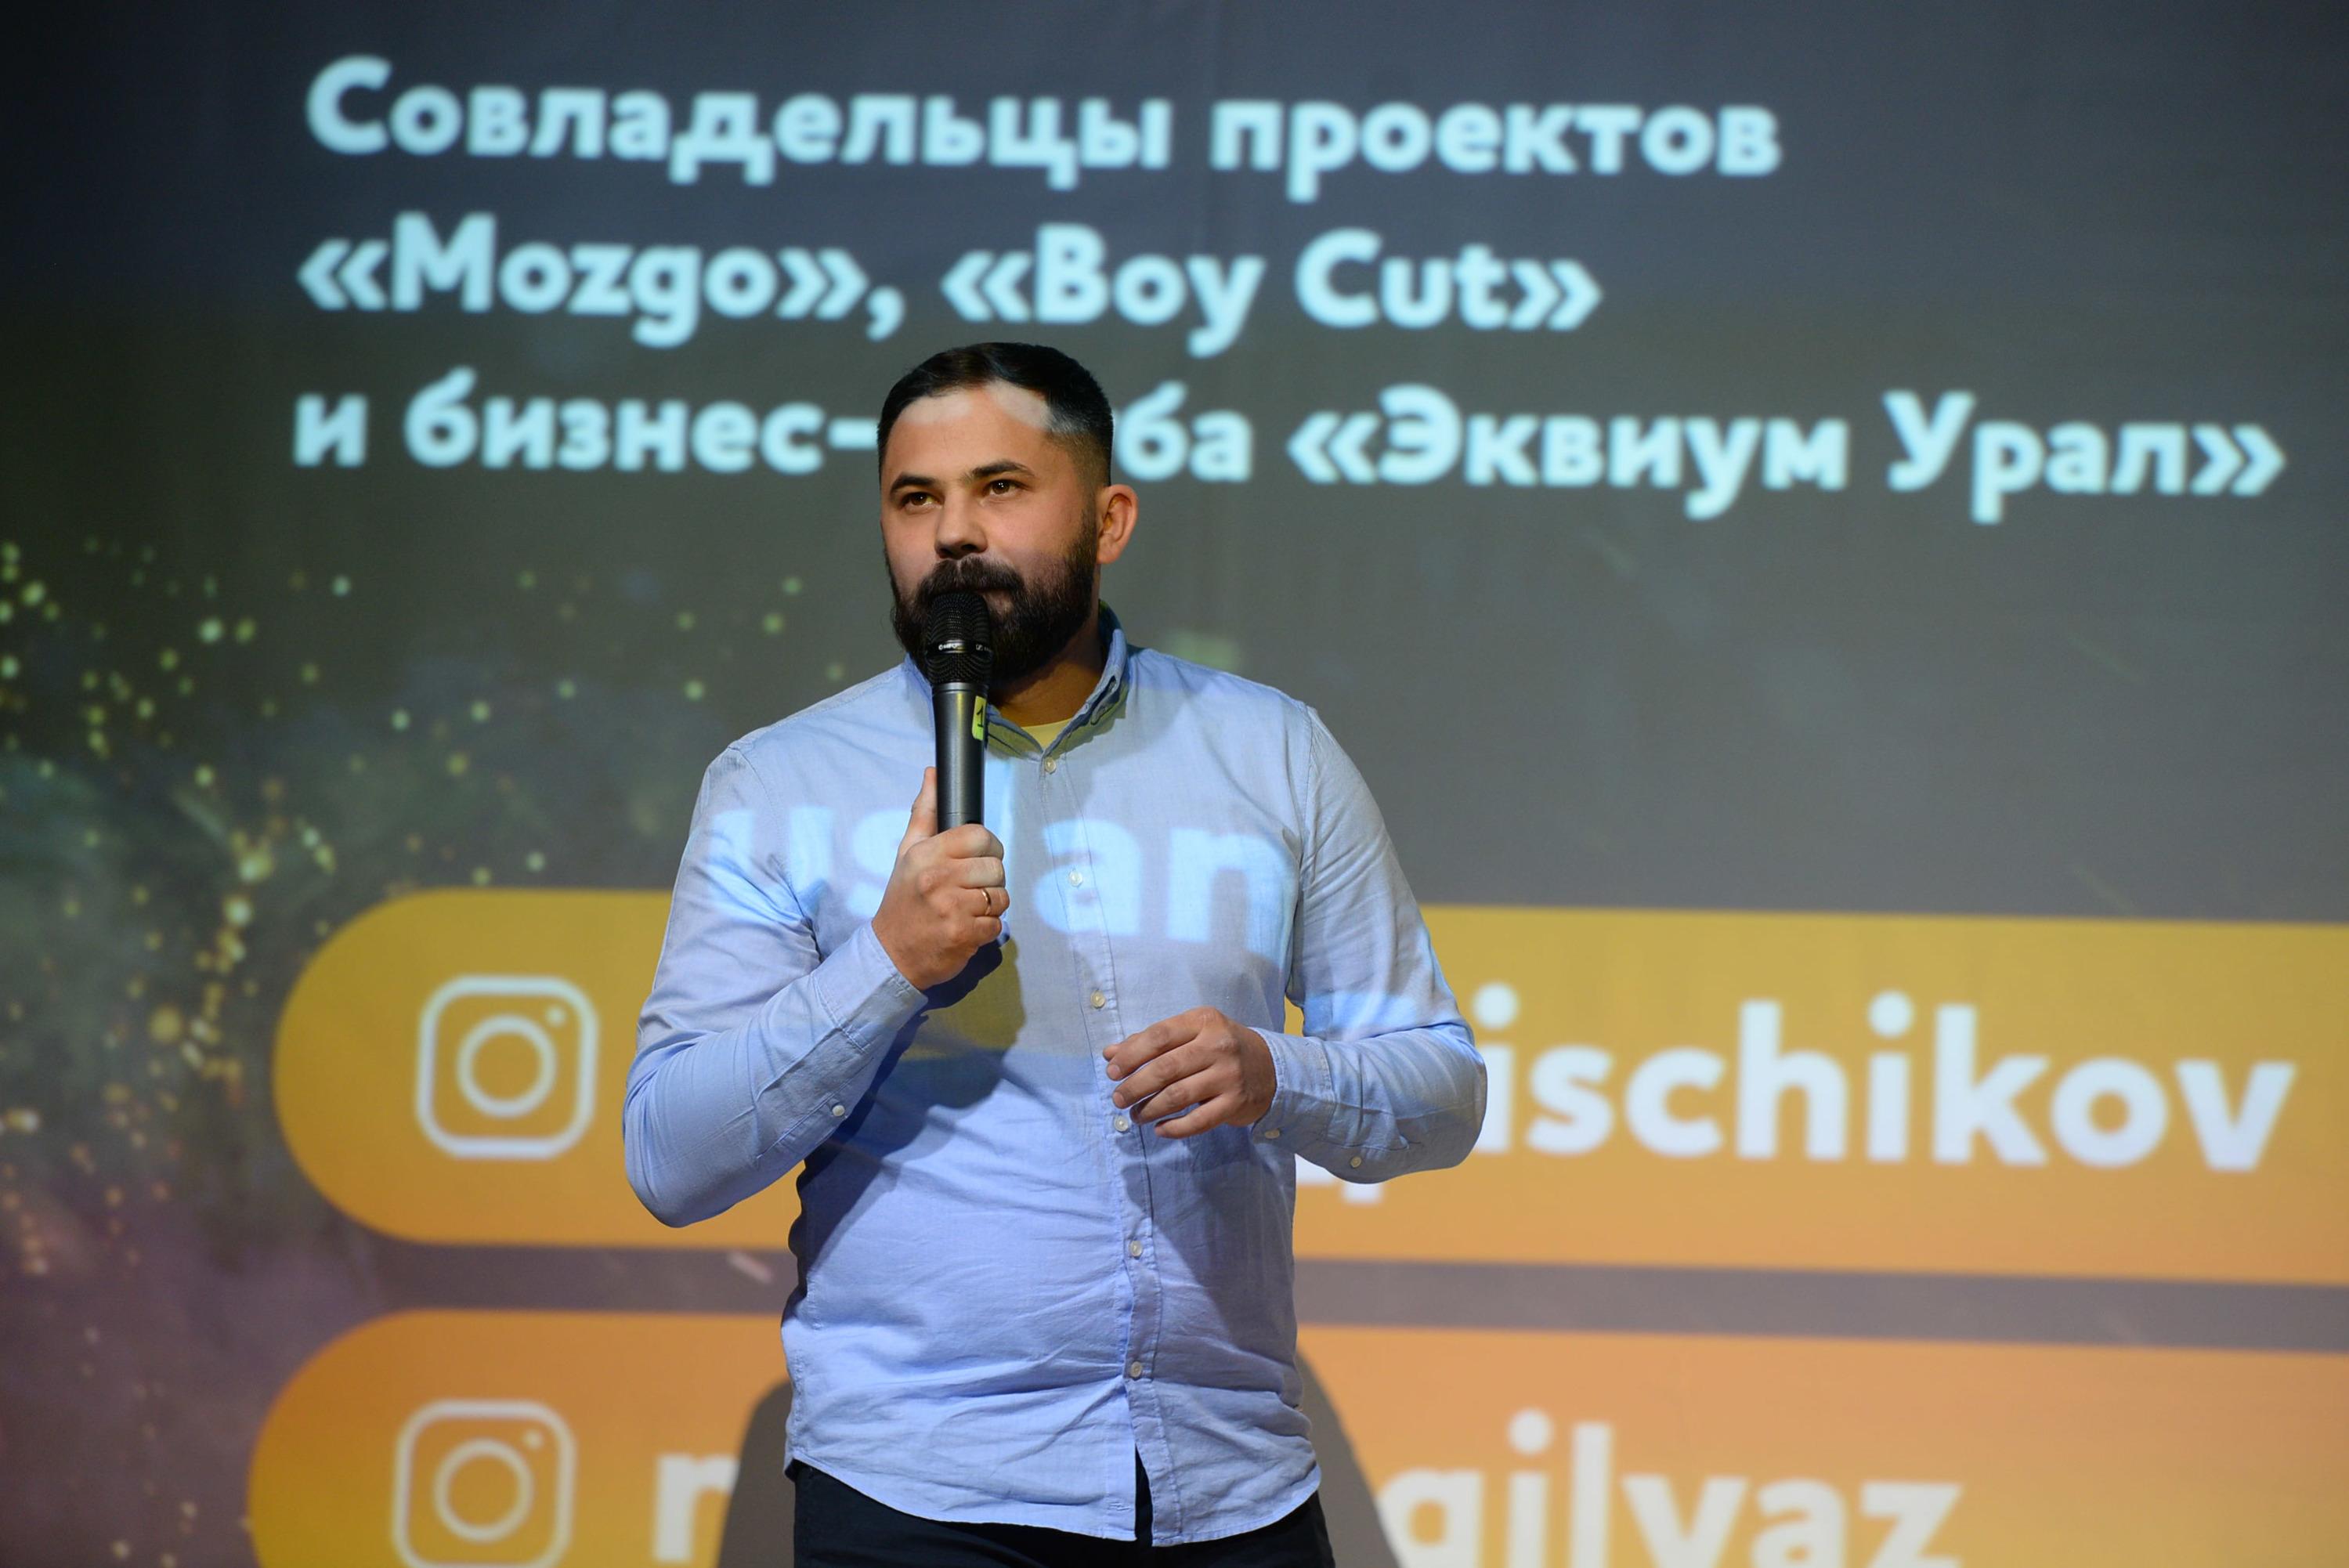 Антон Писчиков